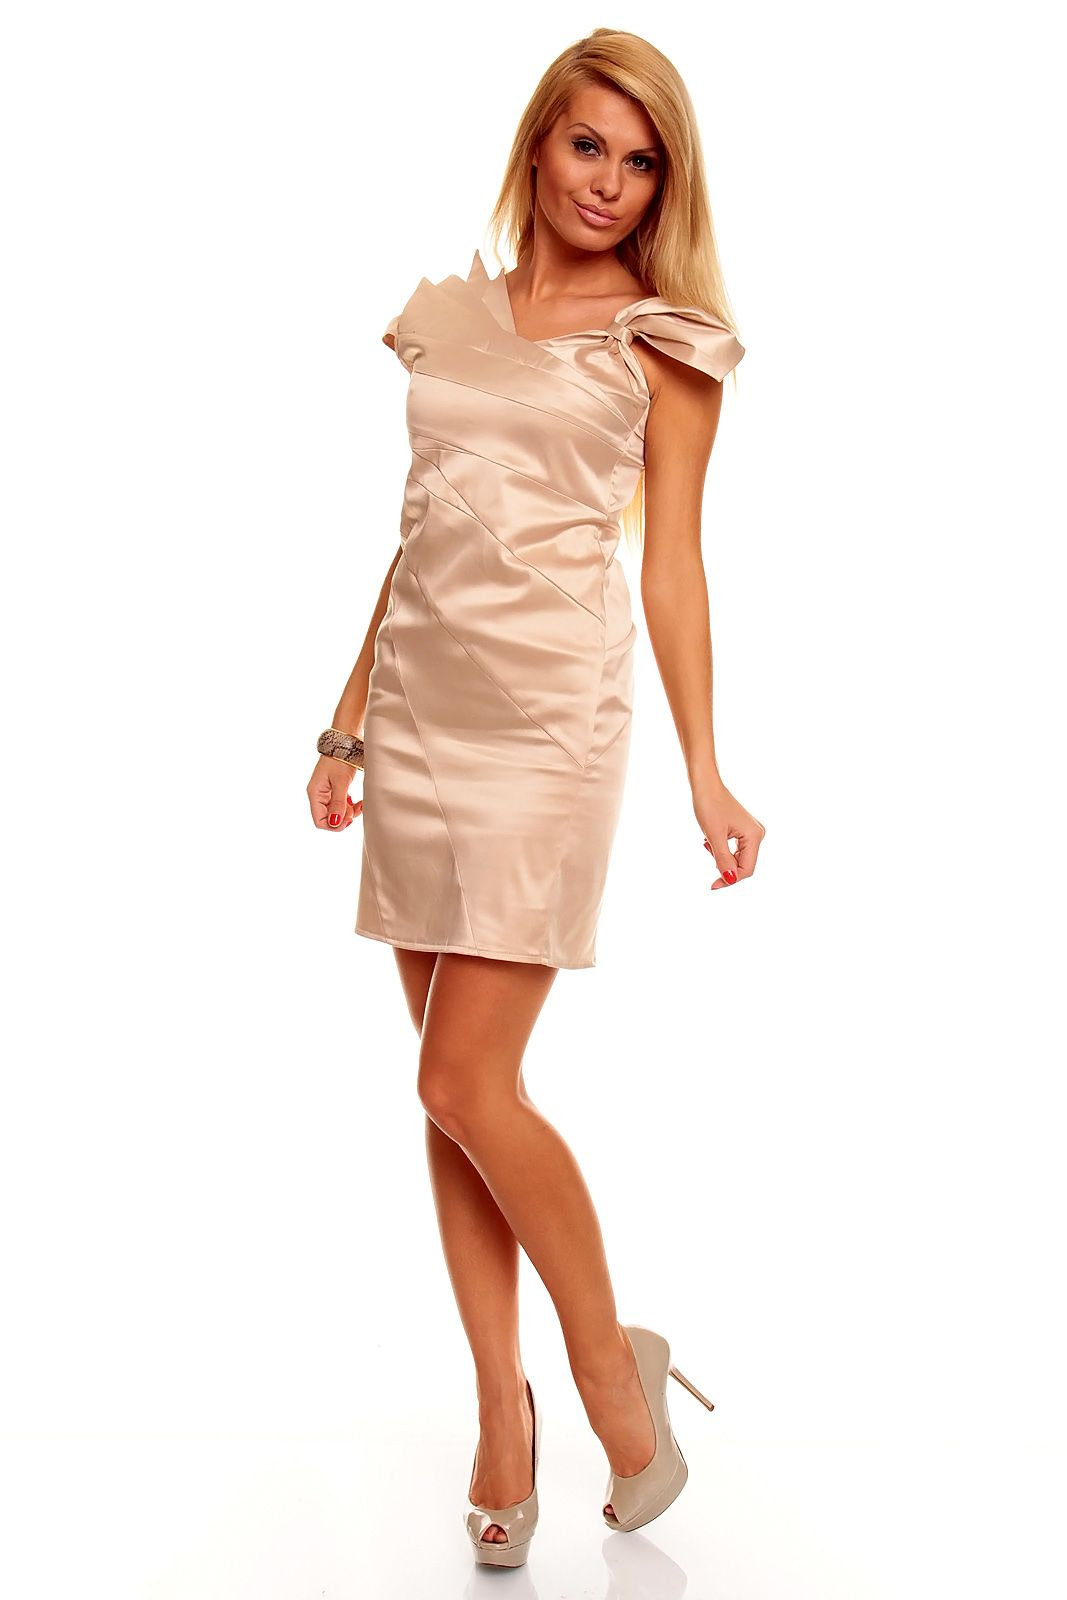 Neu im Kitten-Shop! Elegantes cremefarbenes Kleid mit ...